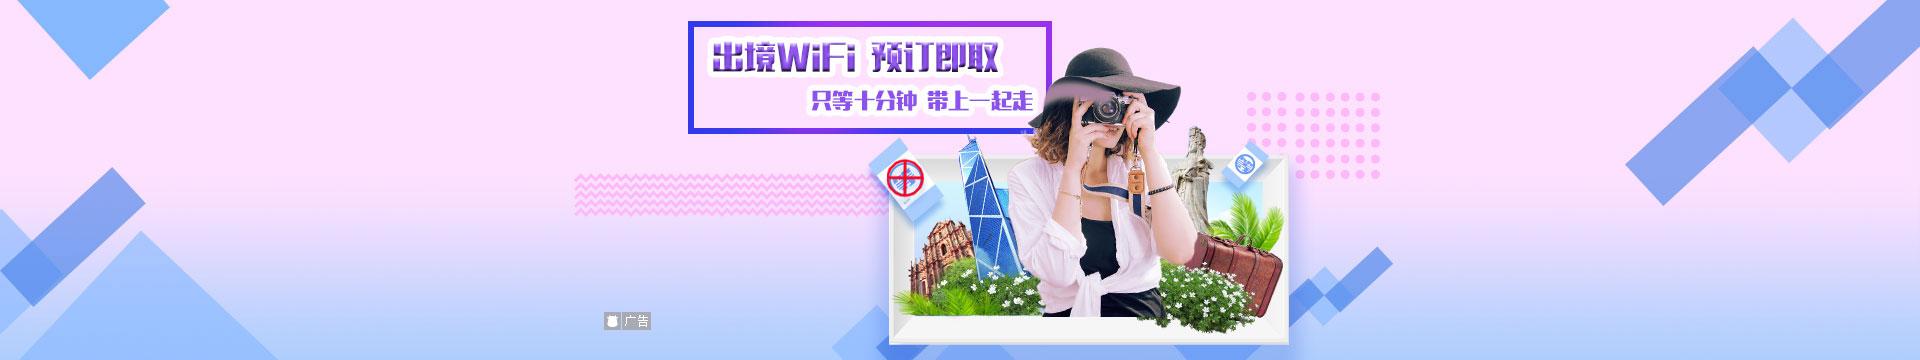 出境WIFI,出境WIFI